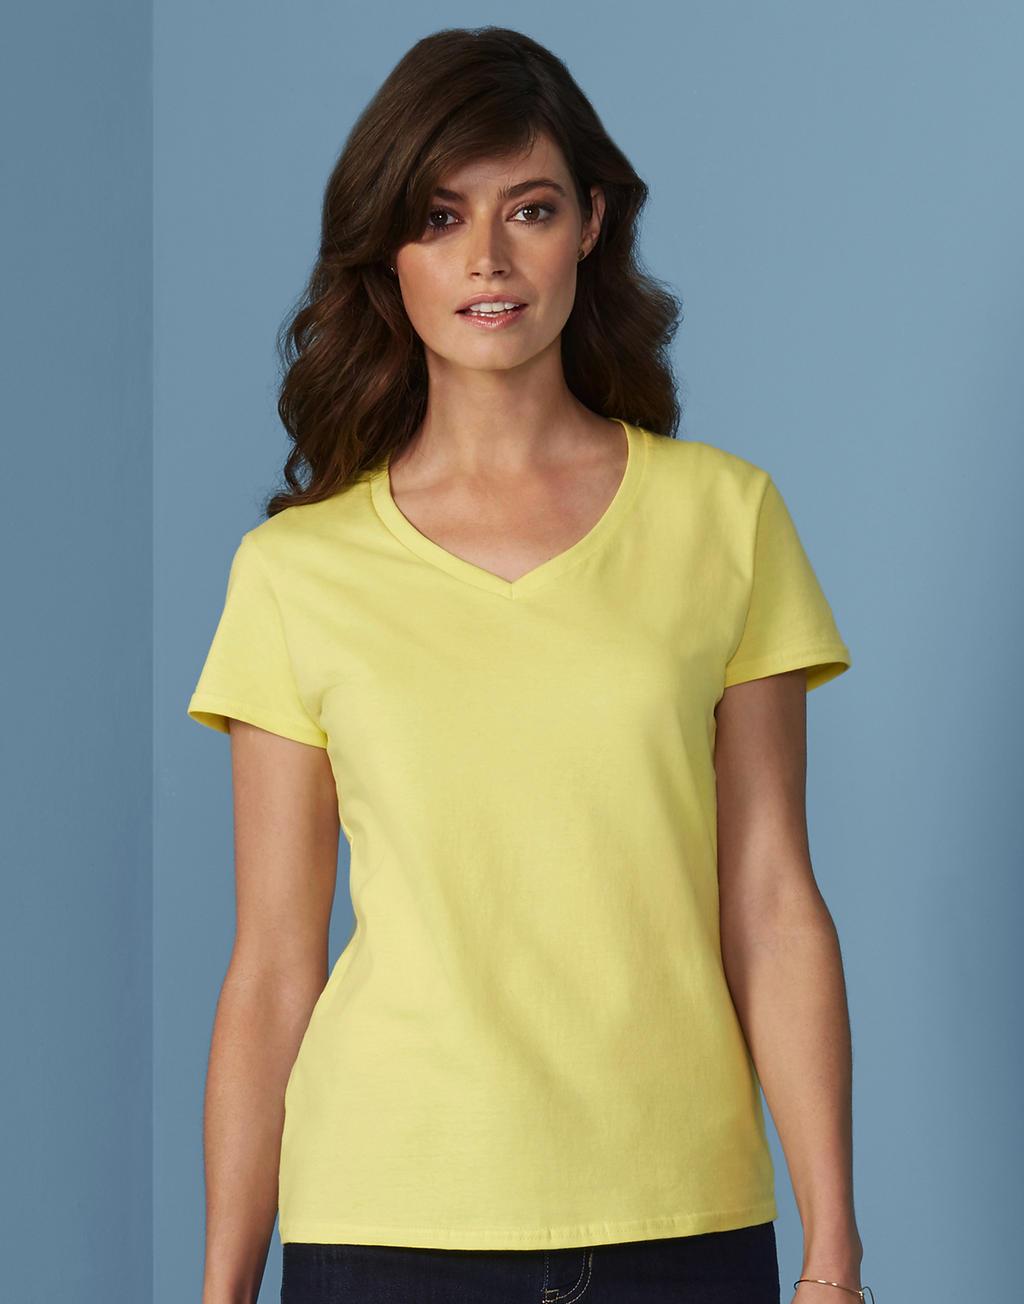 4100VL PREMIUM COTTON® LADIES v-neck tričko